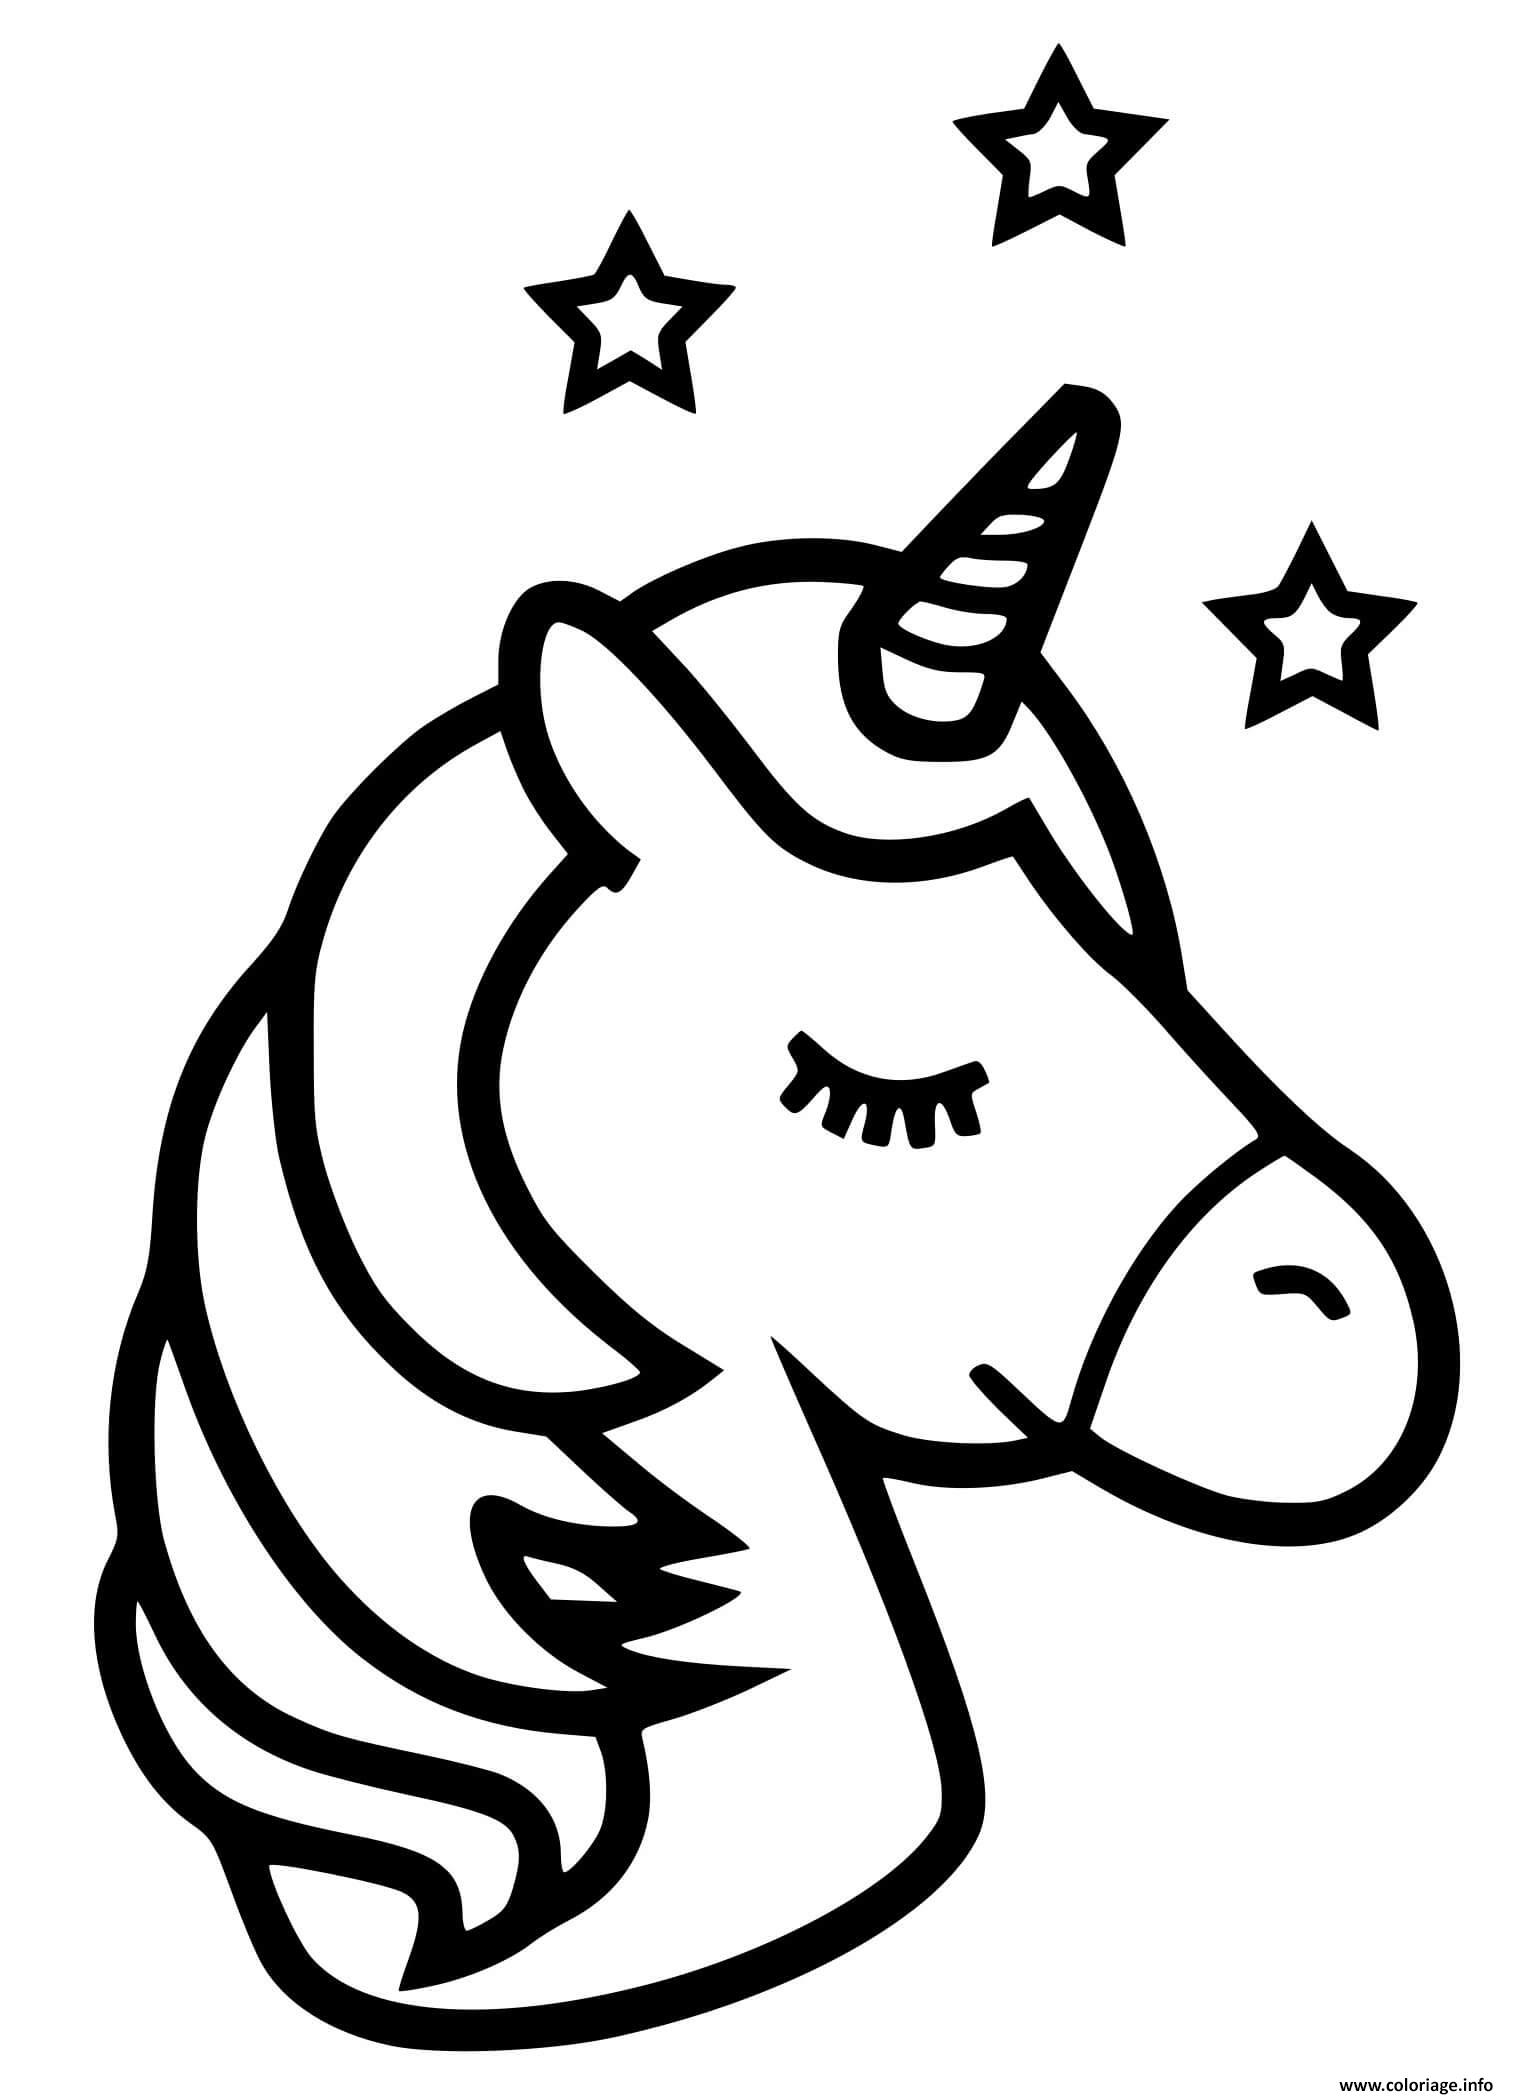 Coloriage licorne emoji kawaii etoiles - JeColorie.com